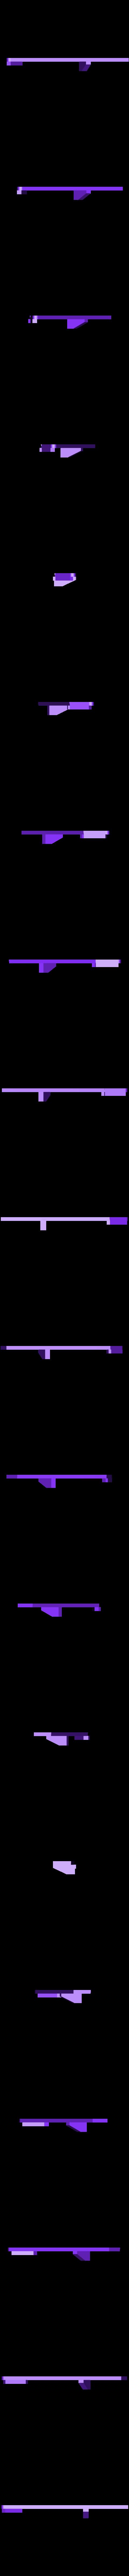 Run_Board_Back-C.STL Download free STL file 4-8-8-4 Big Boy Locomotive • 3D printer object, RaymondDeLuca